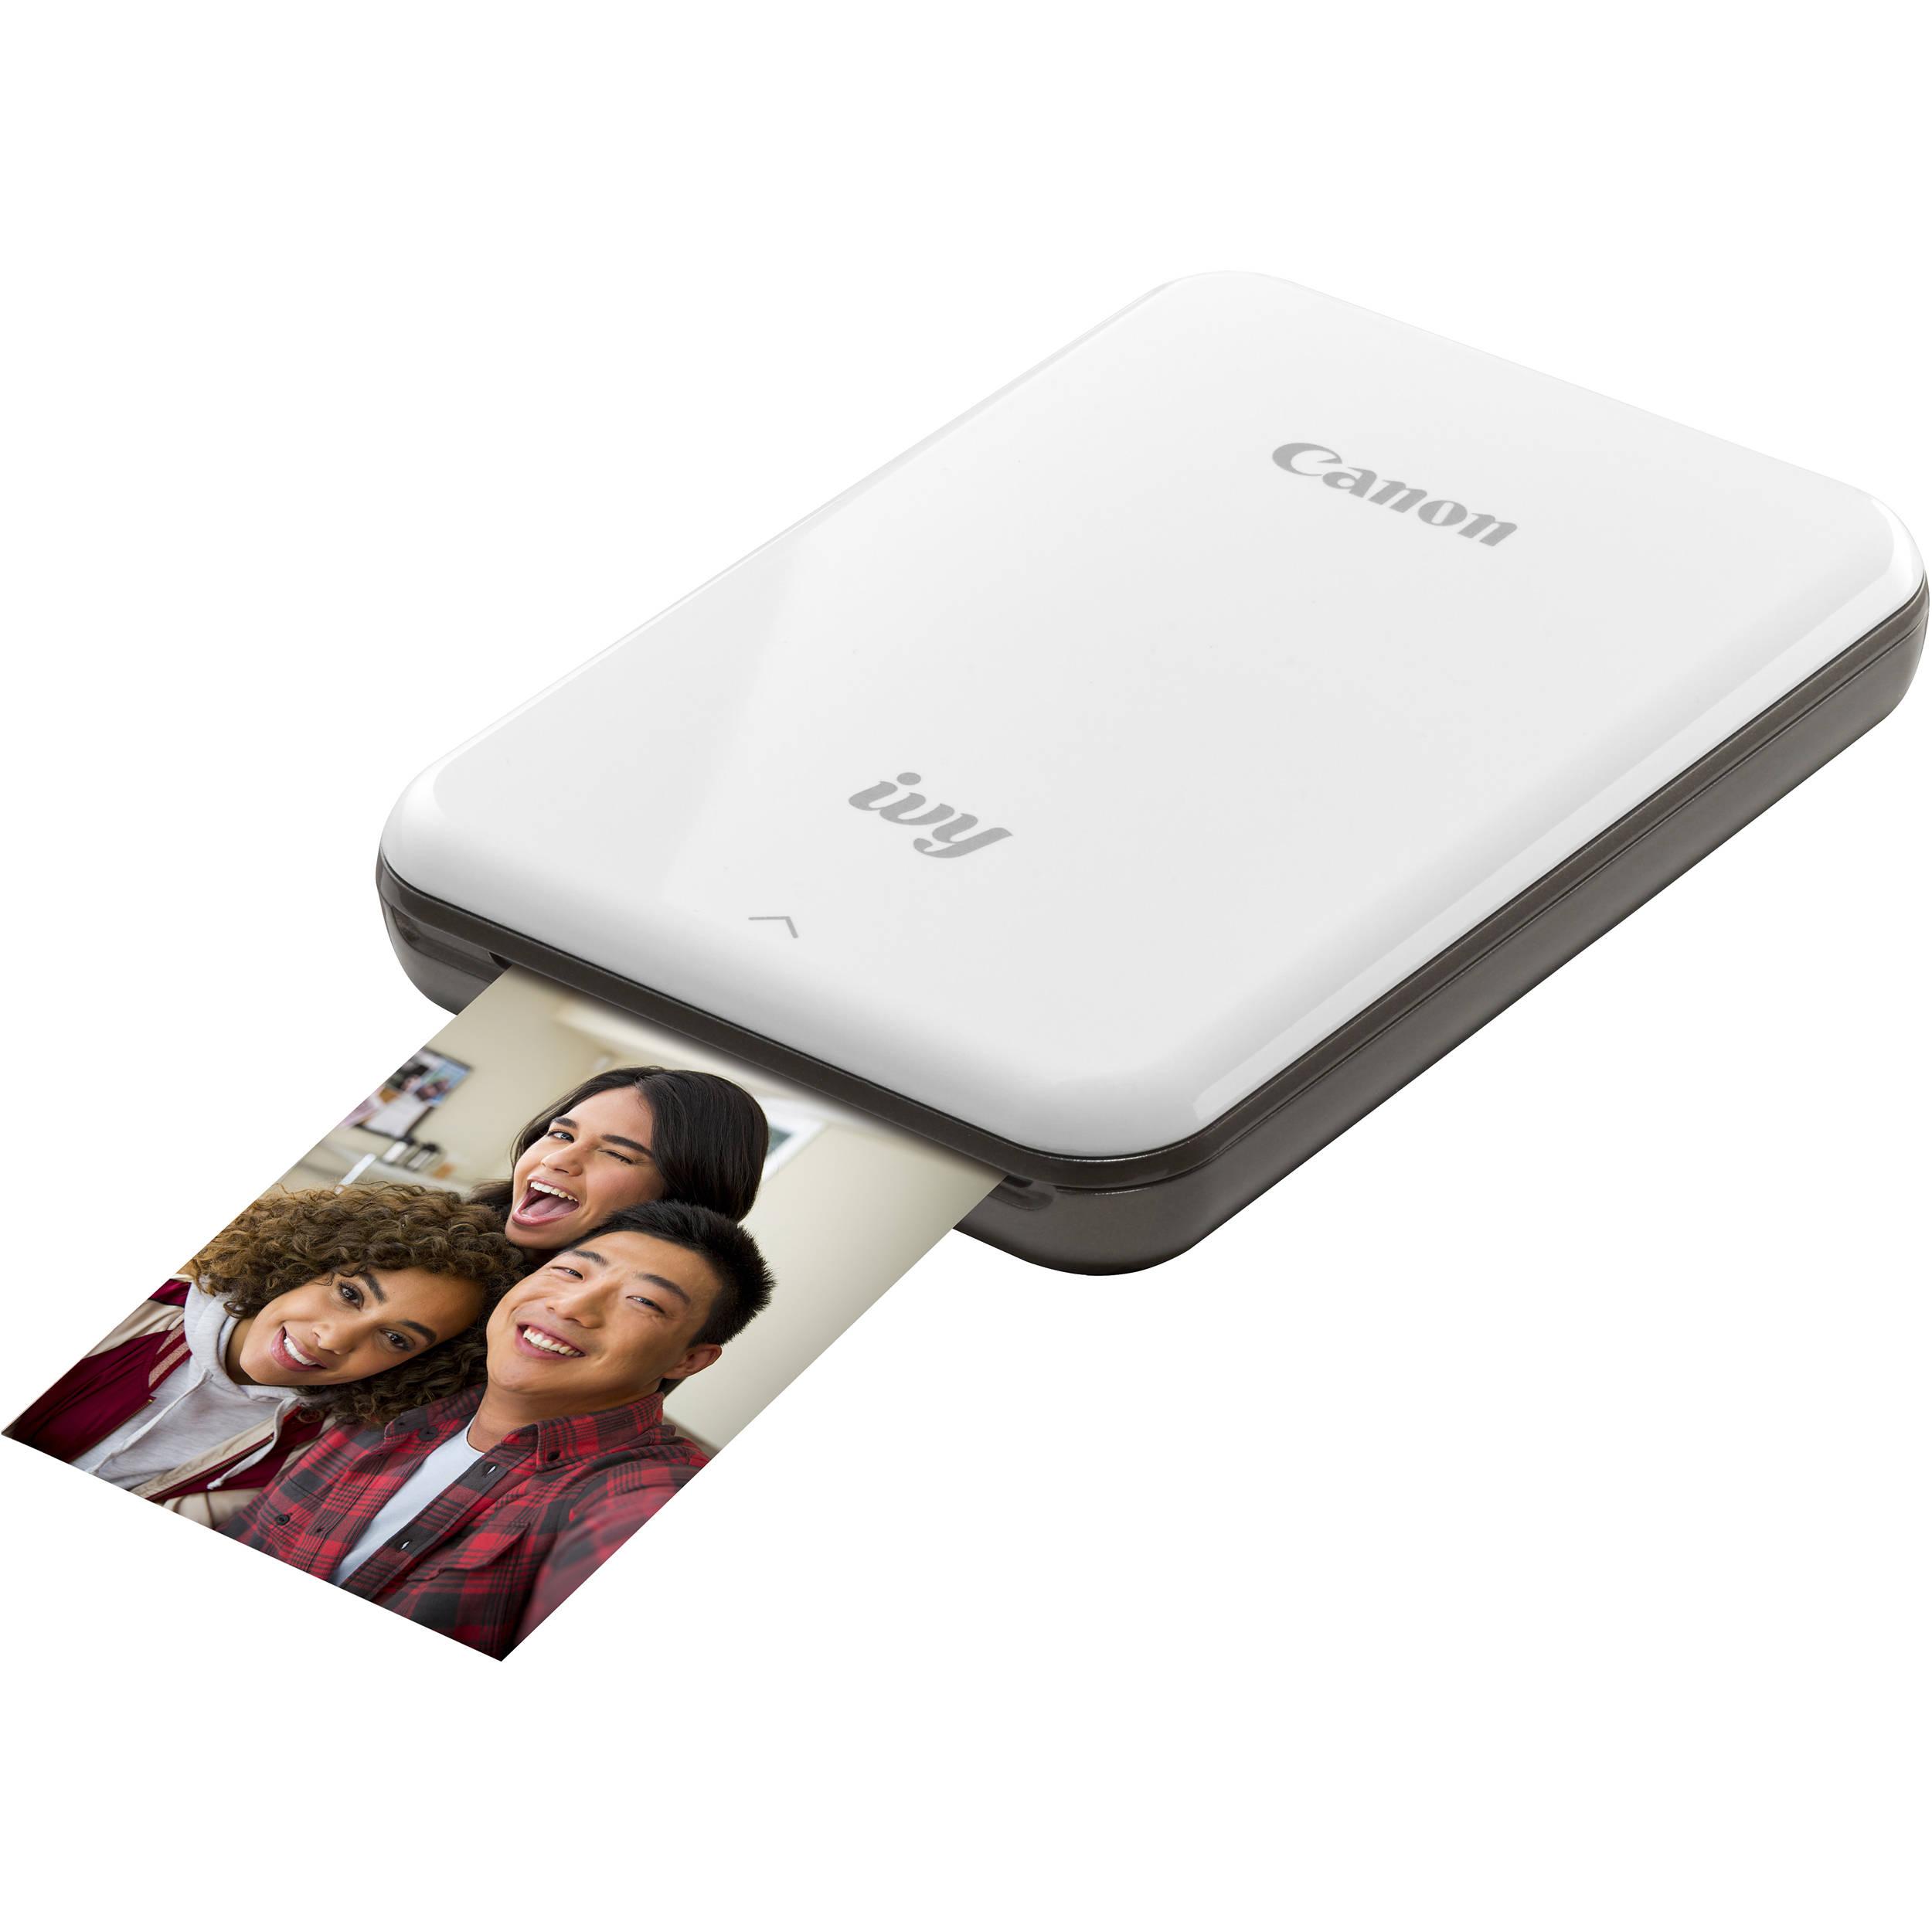 Canon Ivy Mini Mobile Photo Printer Slate Gray 3204c003 B Amp H